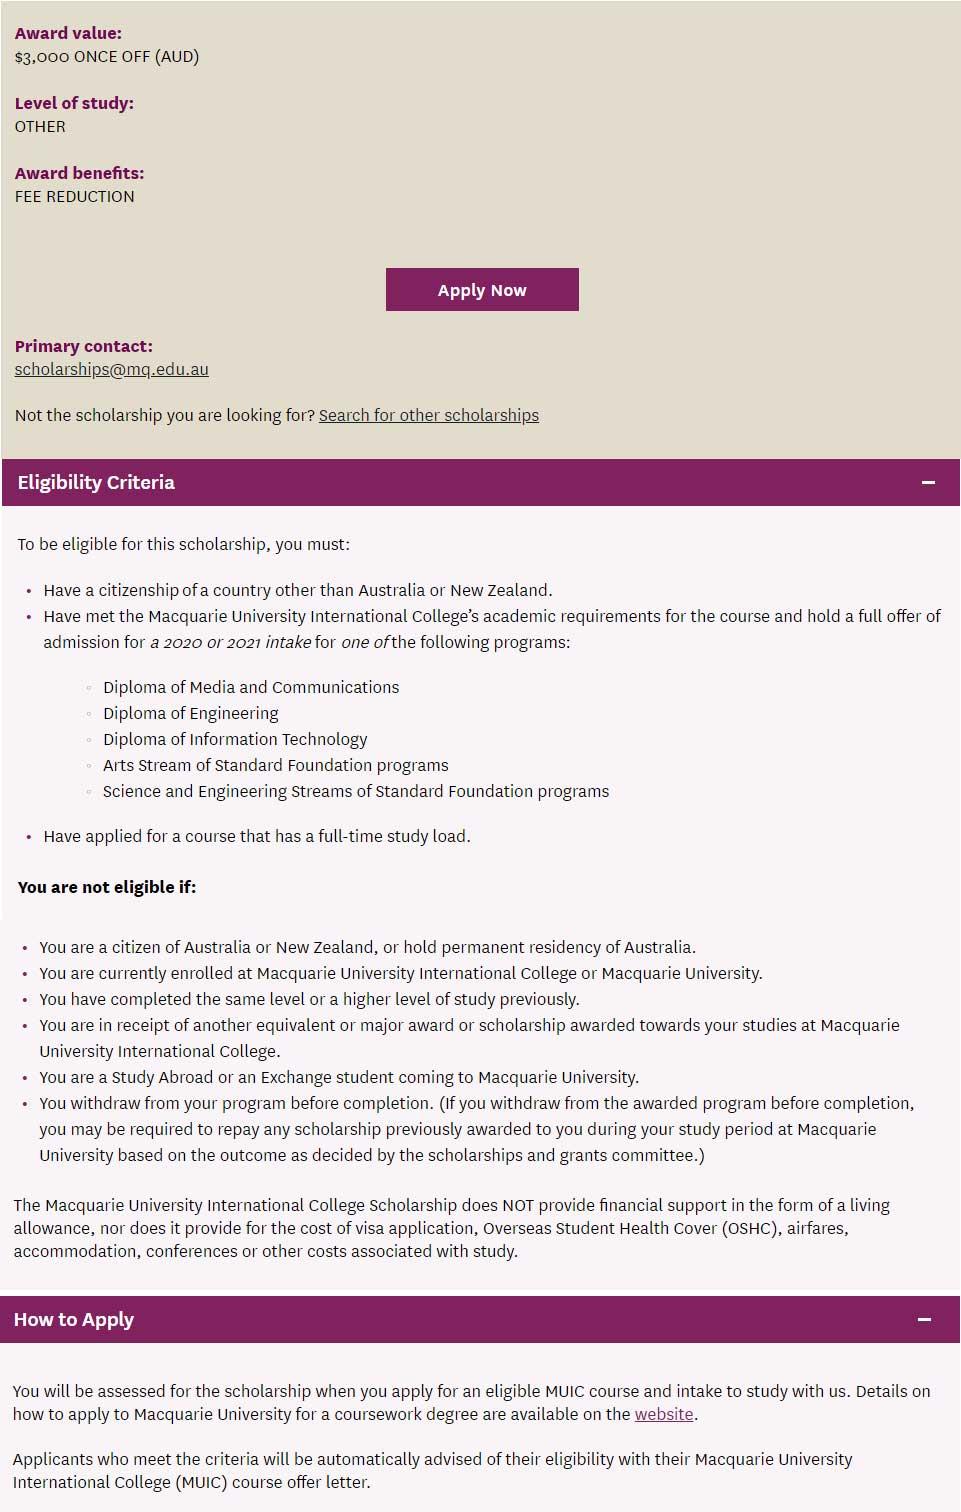 https://ishallwin.com/Content/ScholarshipImages/Undergraduate-International-College-Scholarship-In-Australia,-2020-2.jpg